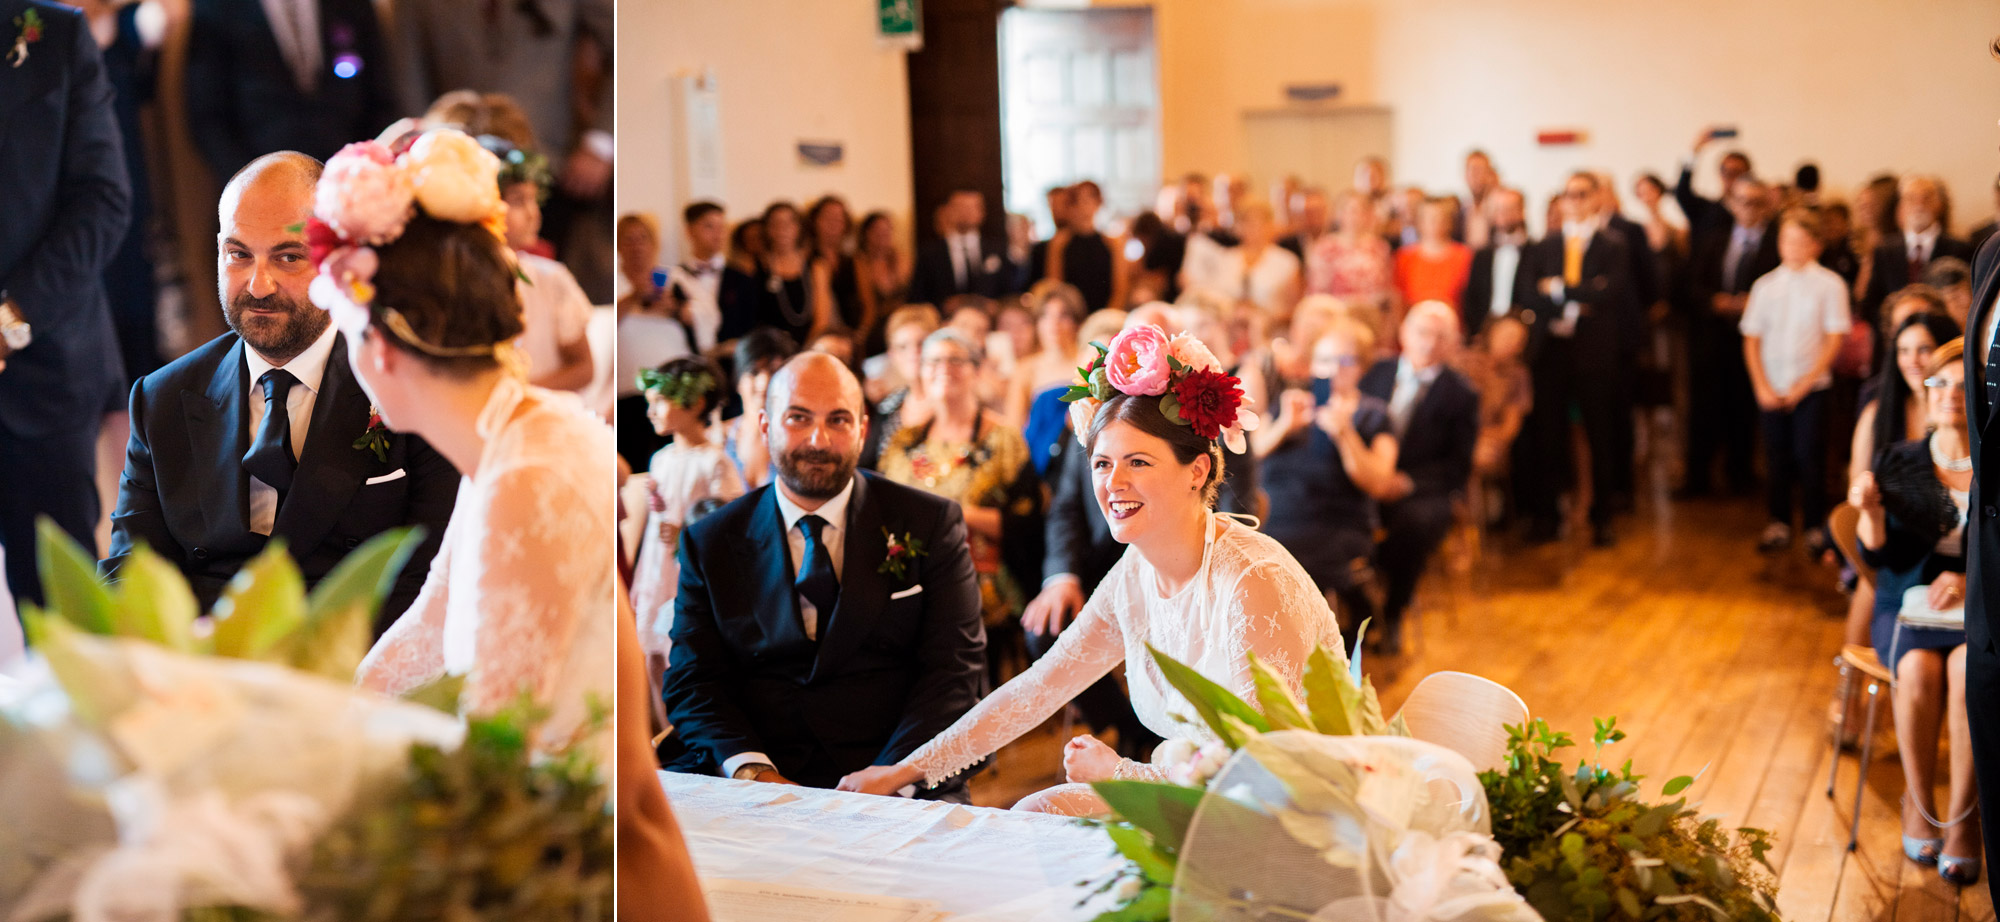 181-FIKUS-PUGLIA-wedding-ostuni-masseria.jpg